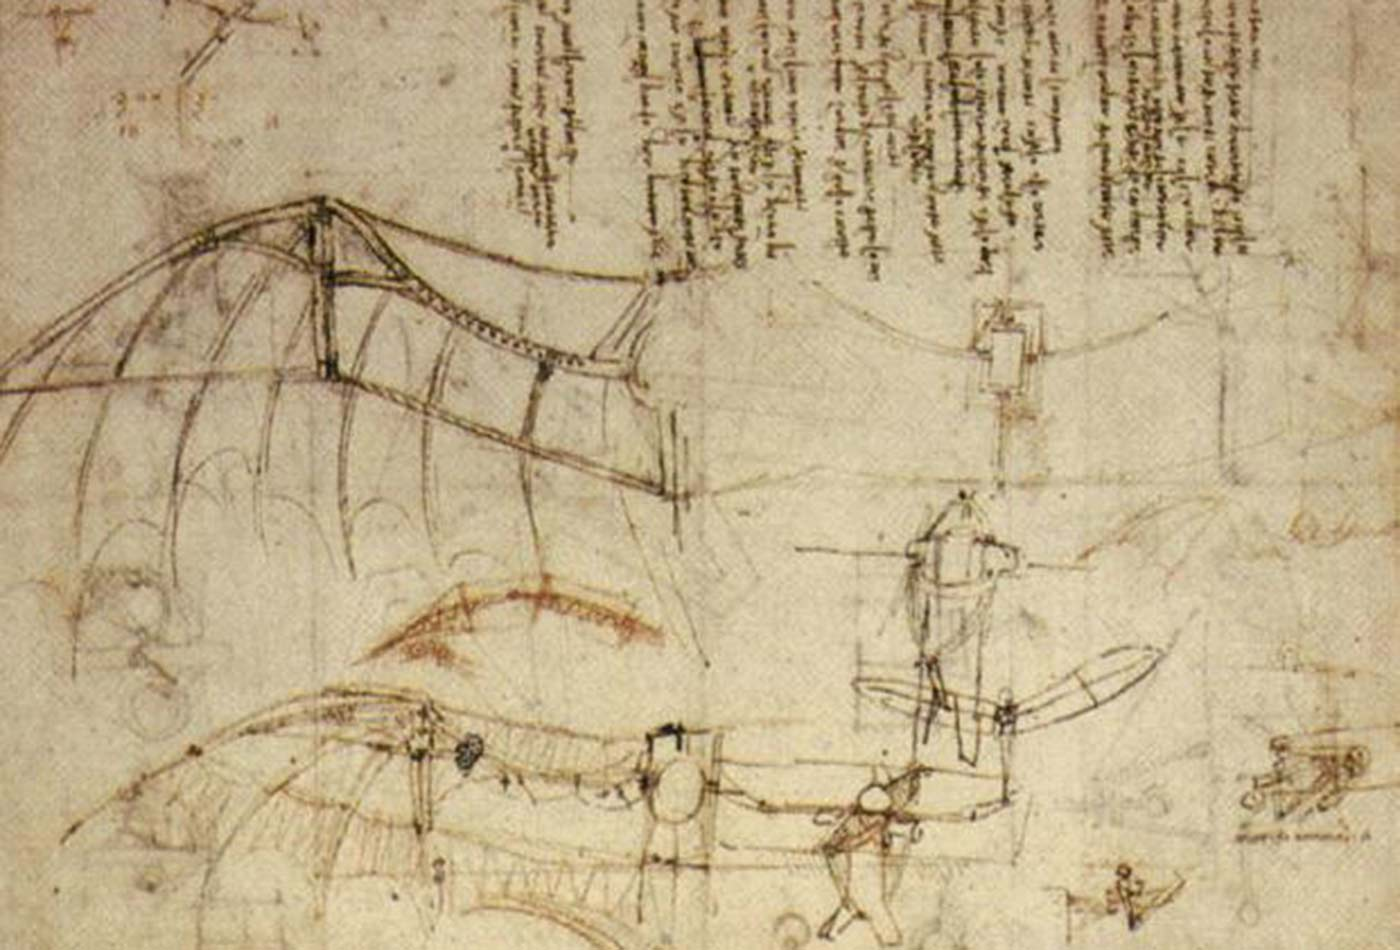 Leonardo da Vinci's design for a flying machine.